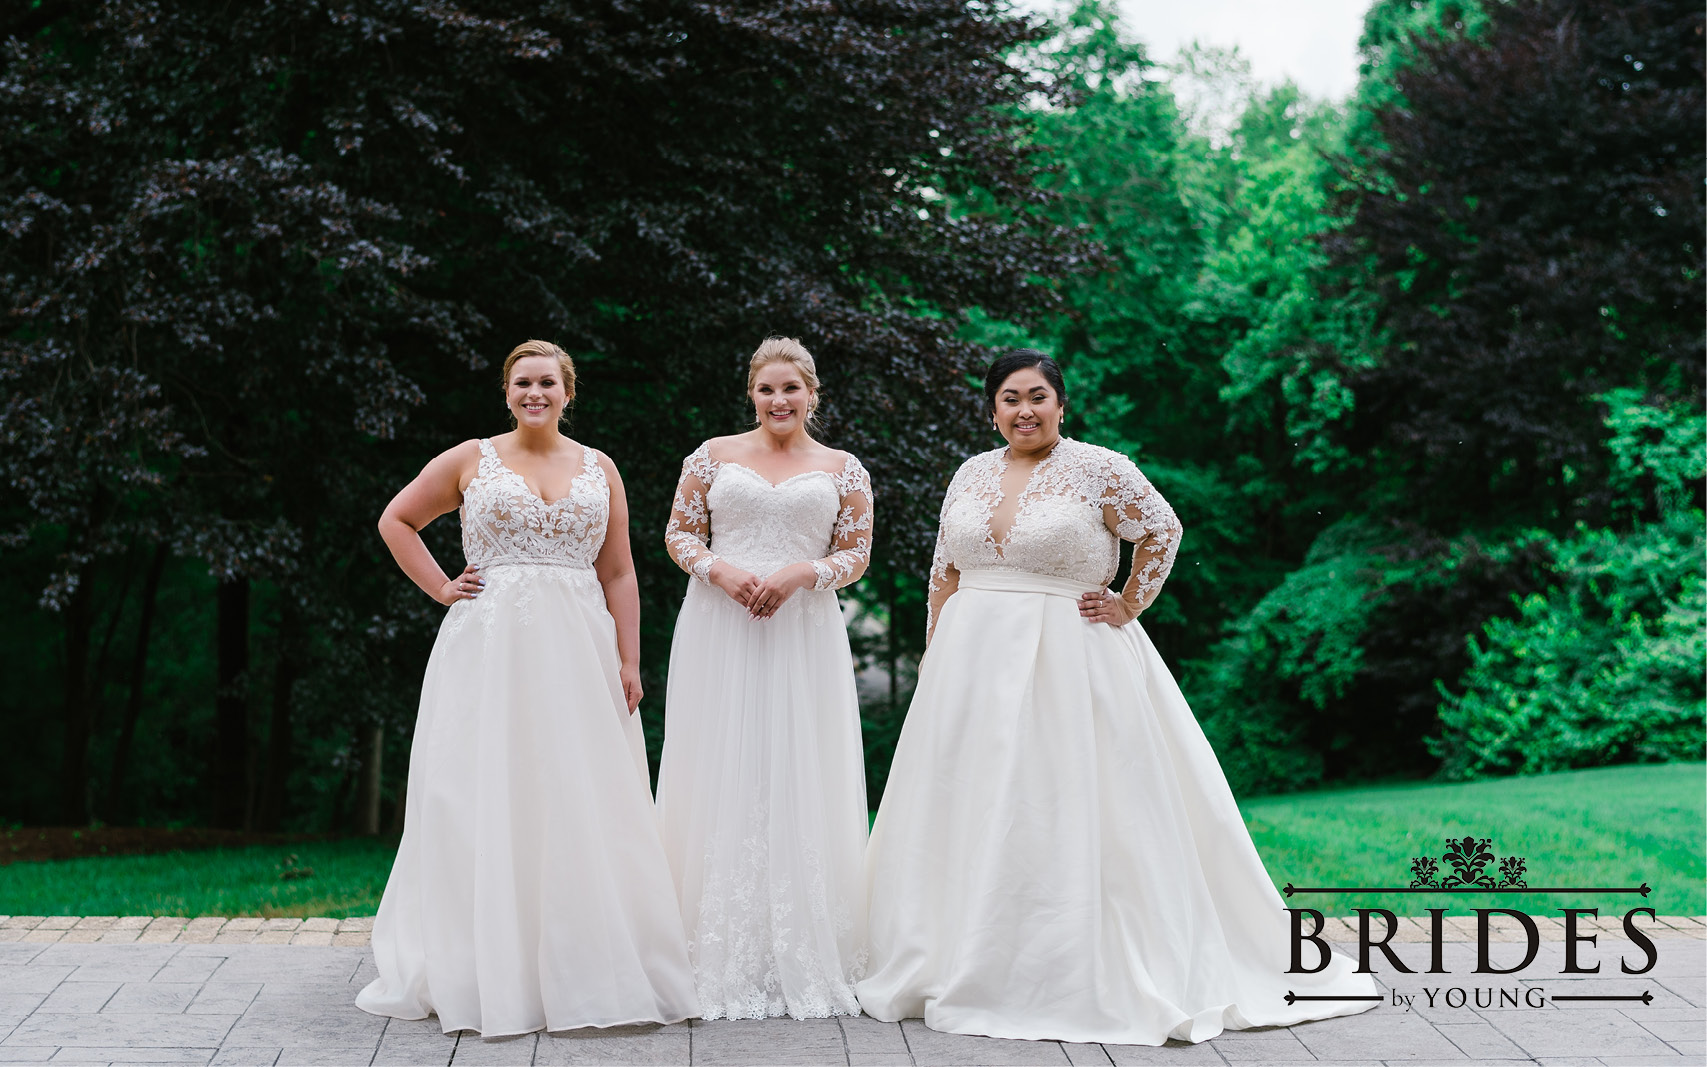 BridesbyYoung-2020Collection-PlusSizeBridalBoutique-CurvyWeddingDressInspiration-111.jpg